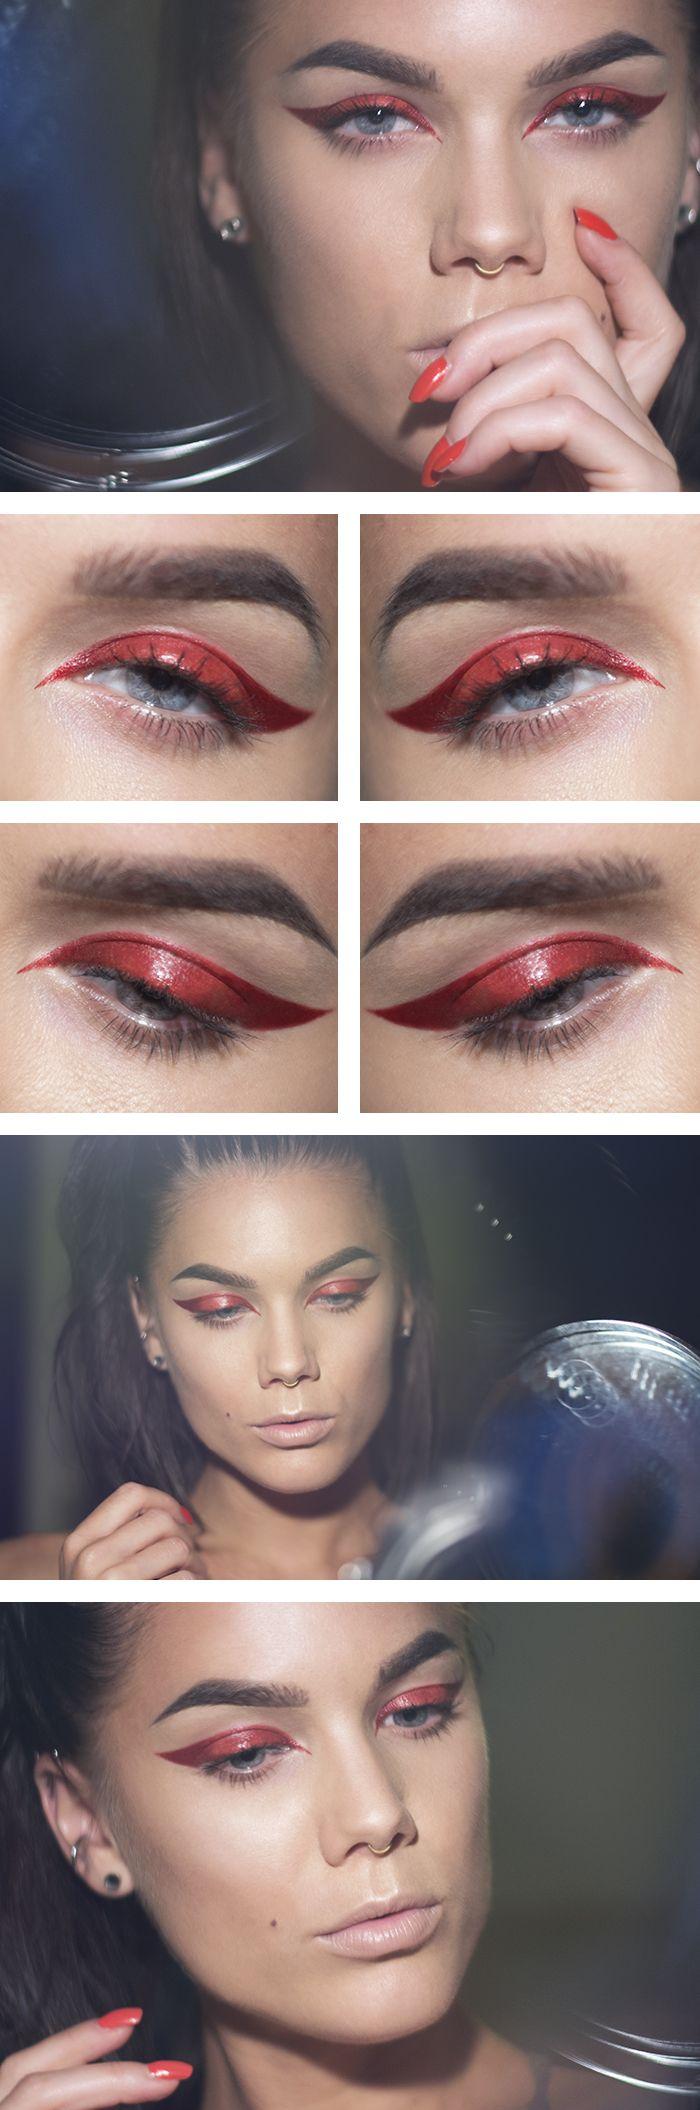 The 25+ best Devil makeup ideas on Pinterest | Fire makeup ...